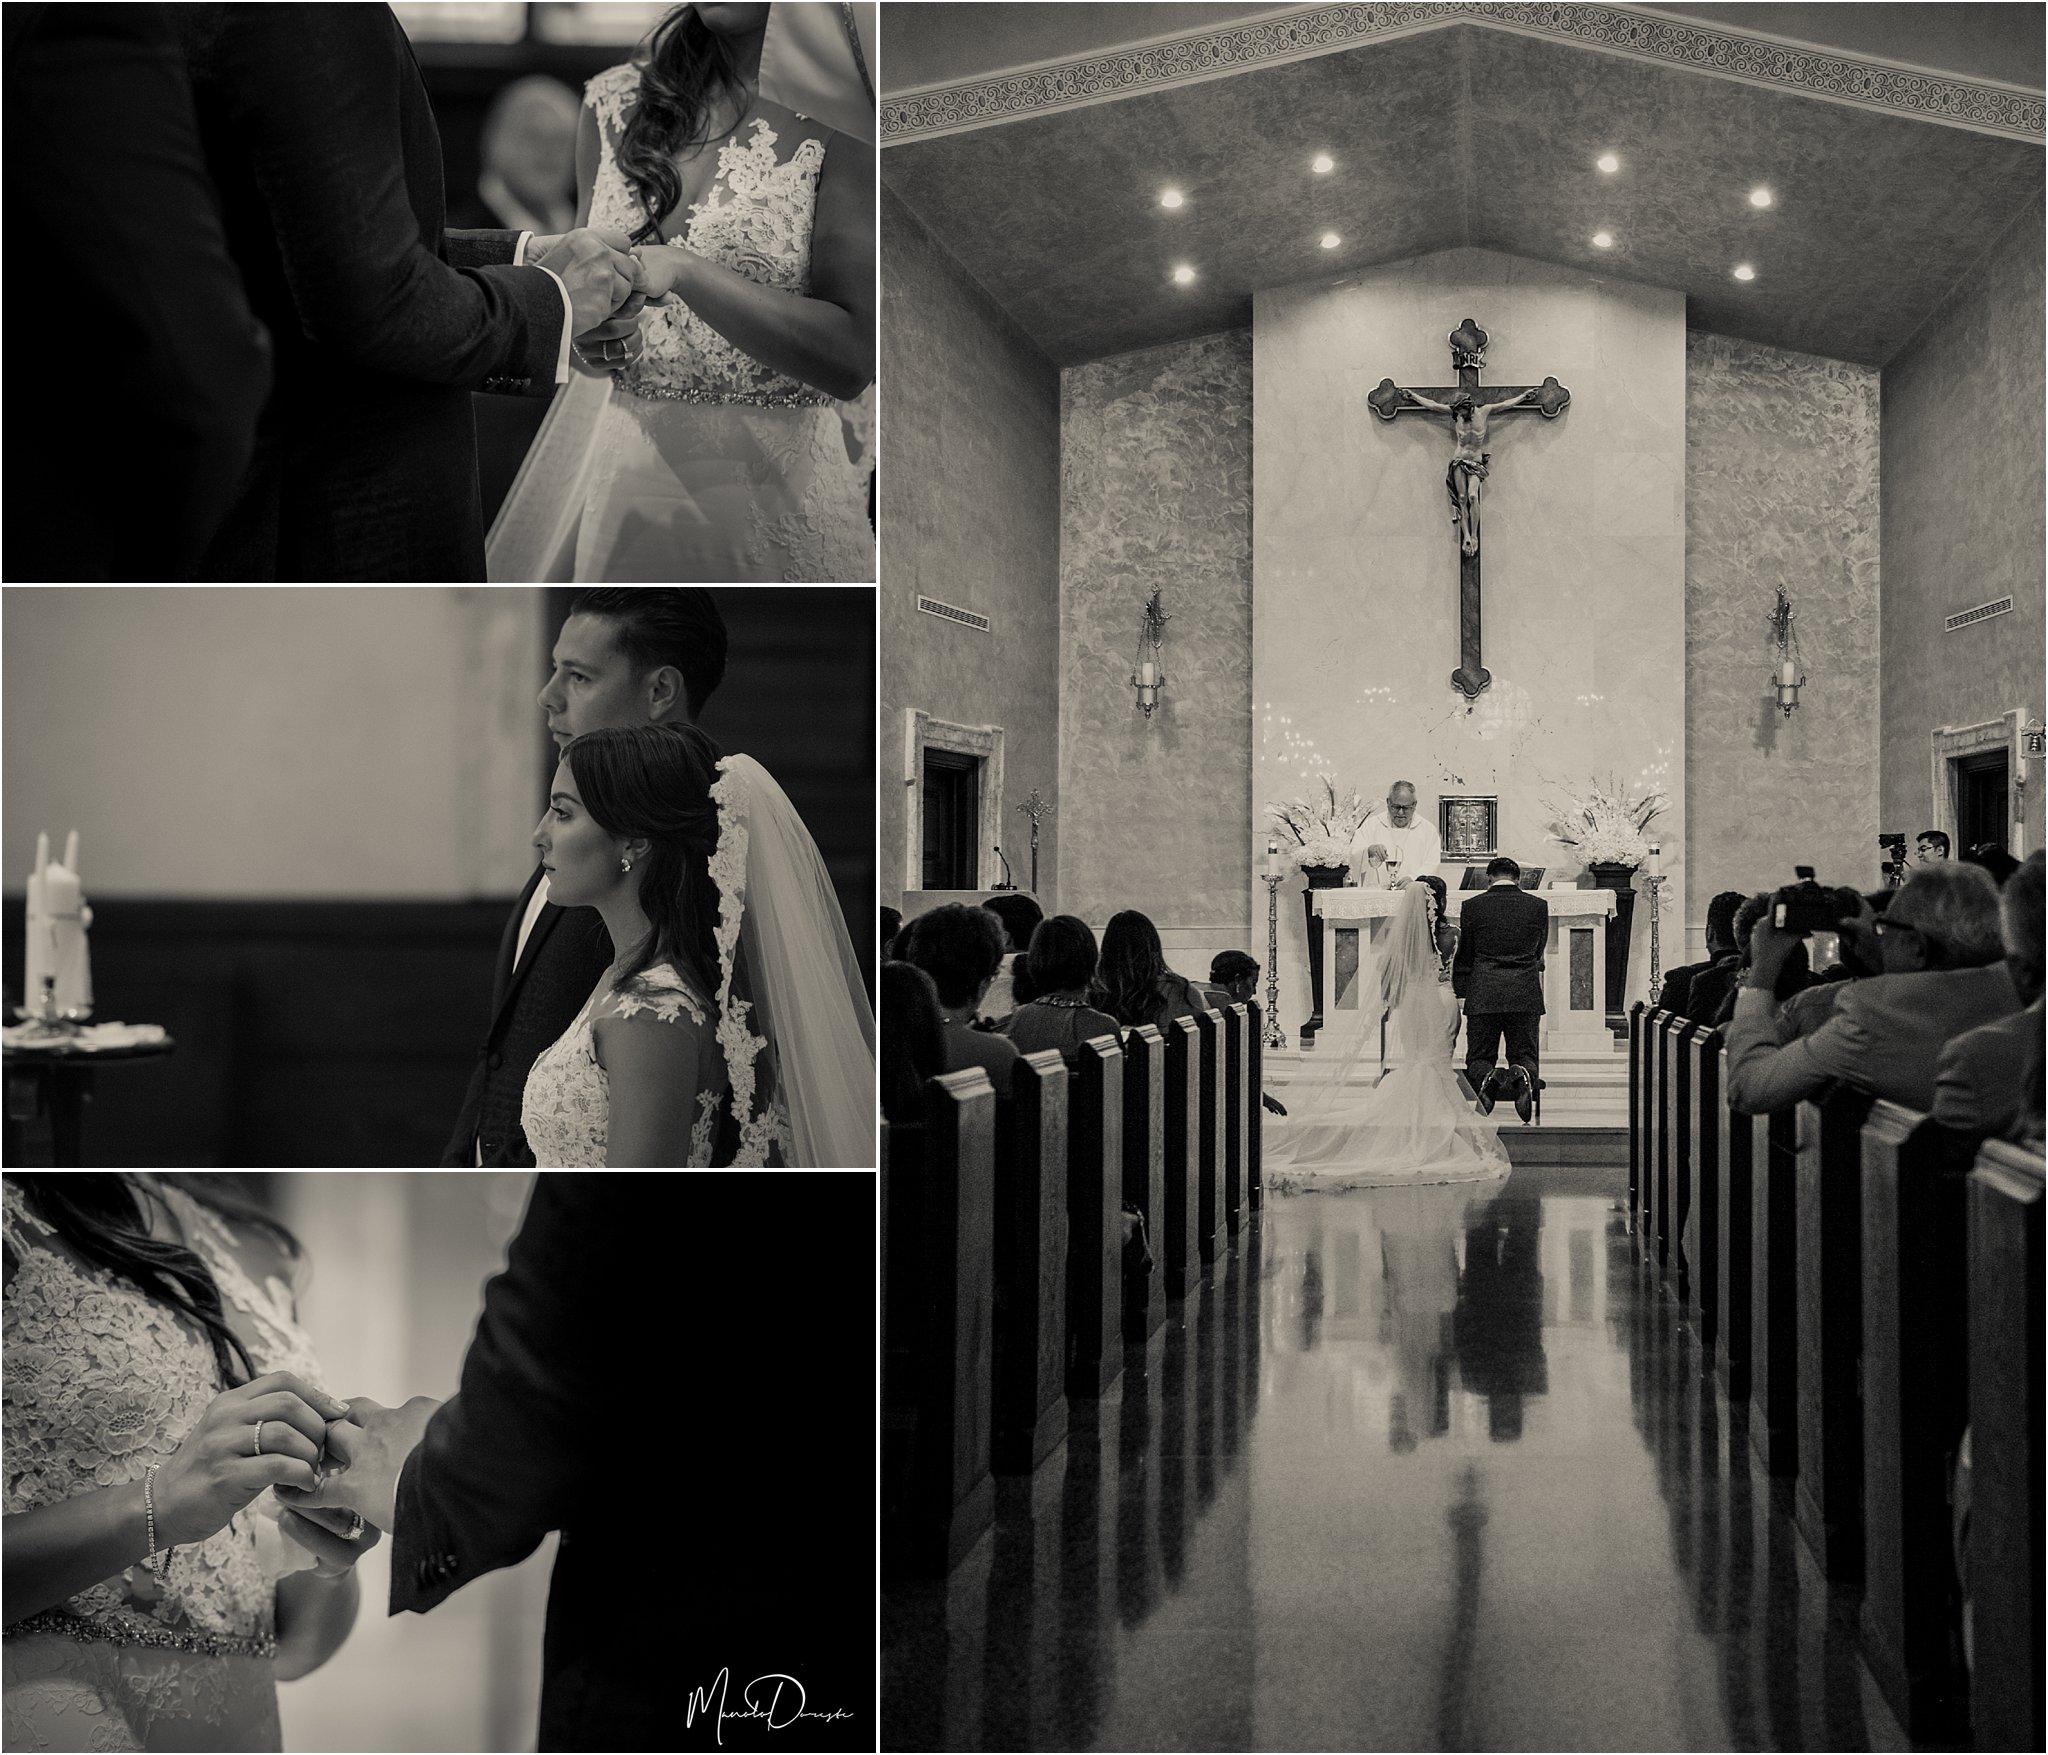 0321_ManoloDoreste_InFocusStudios_Wedding_Family_Photography_Miami_MiamiPhotographer.jpg